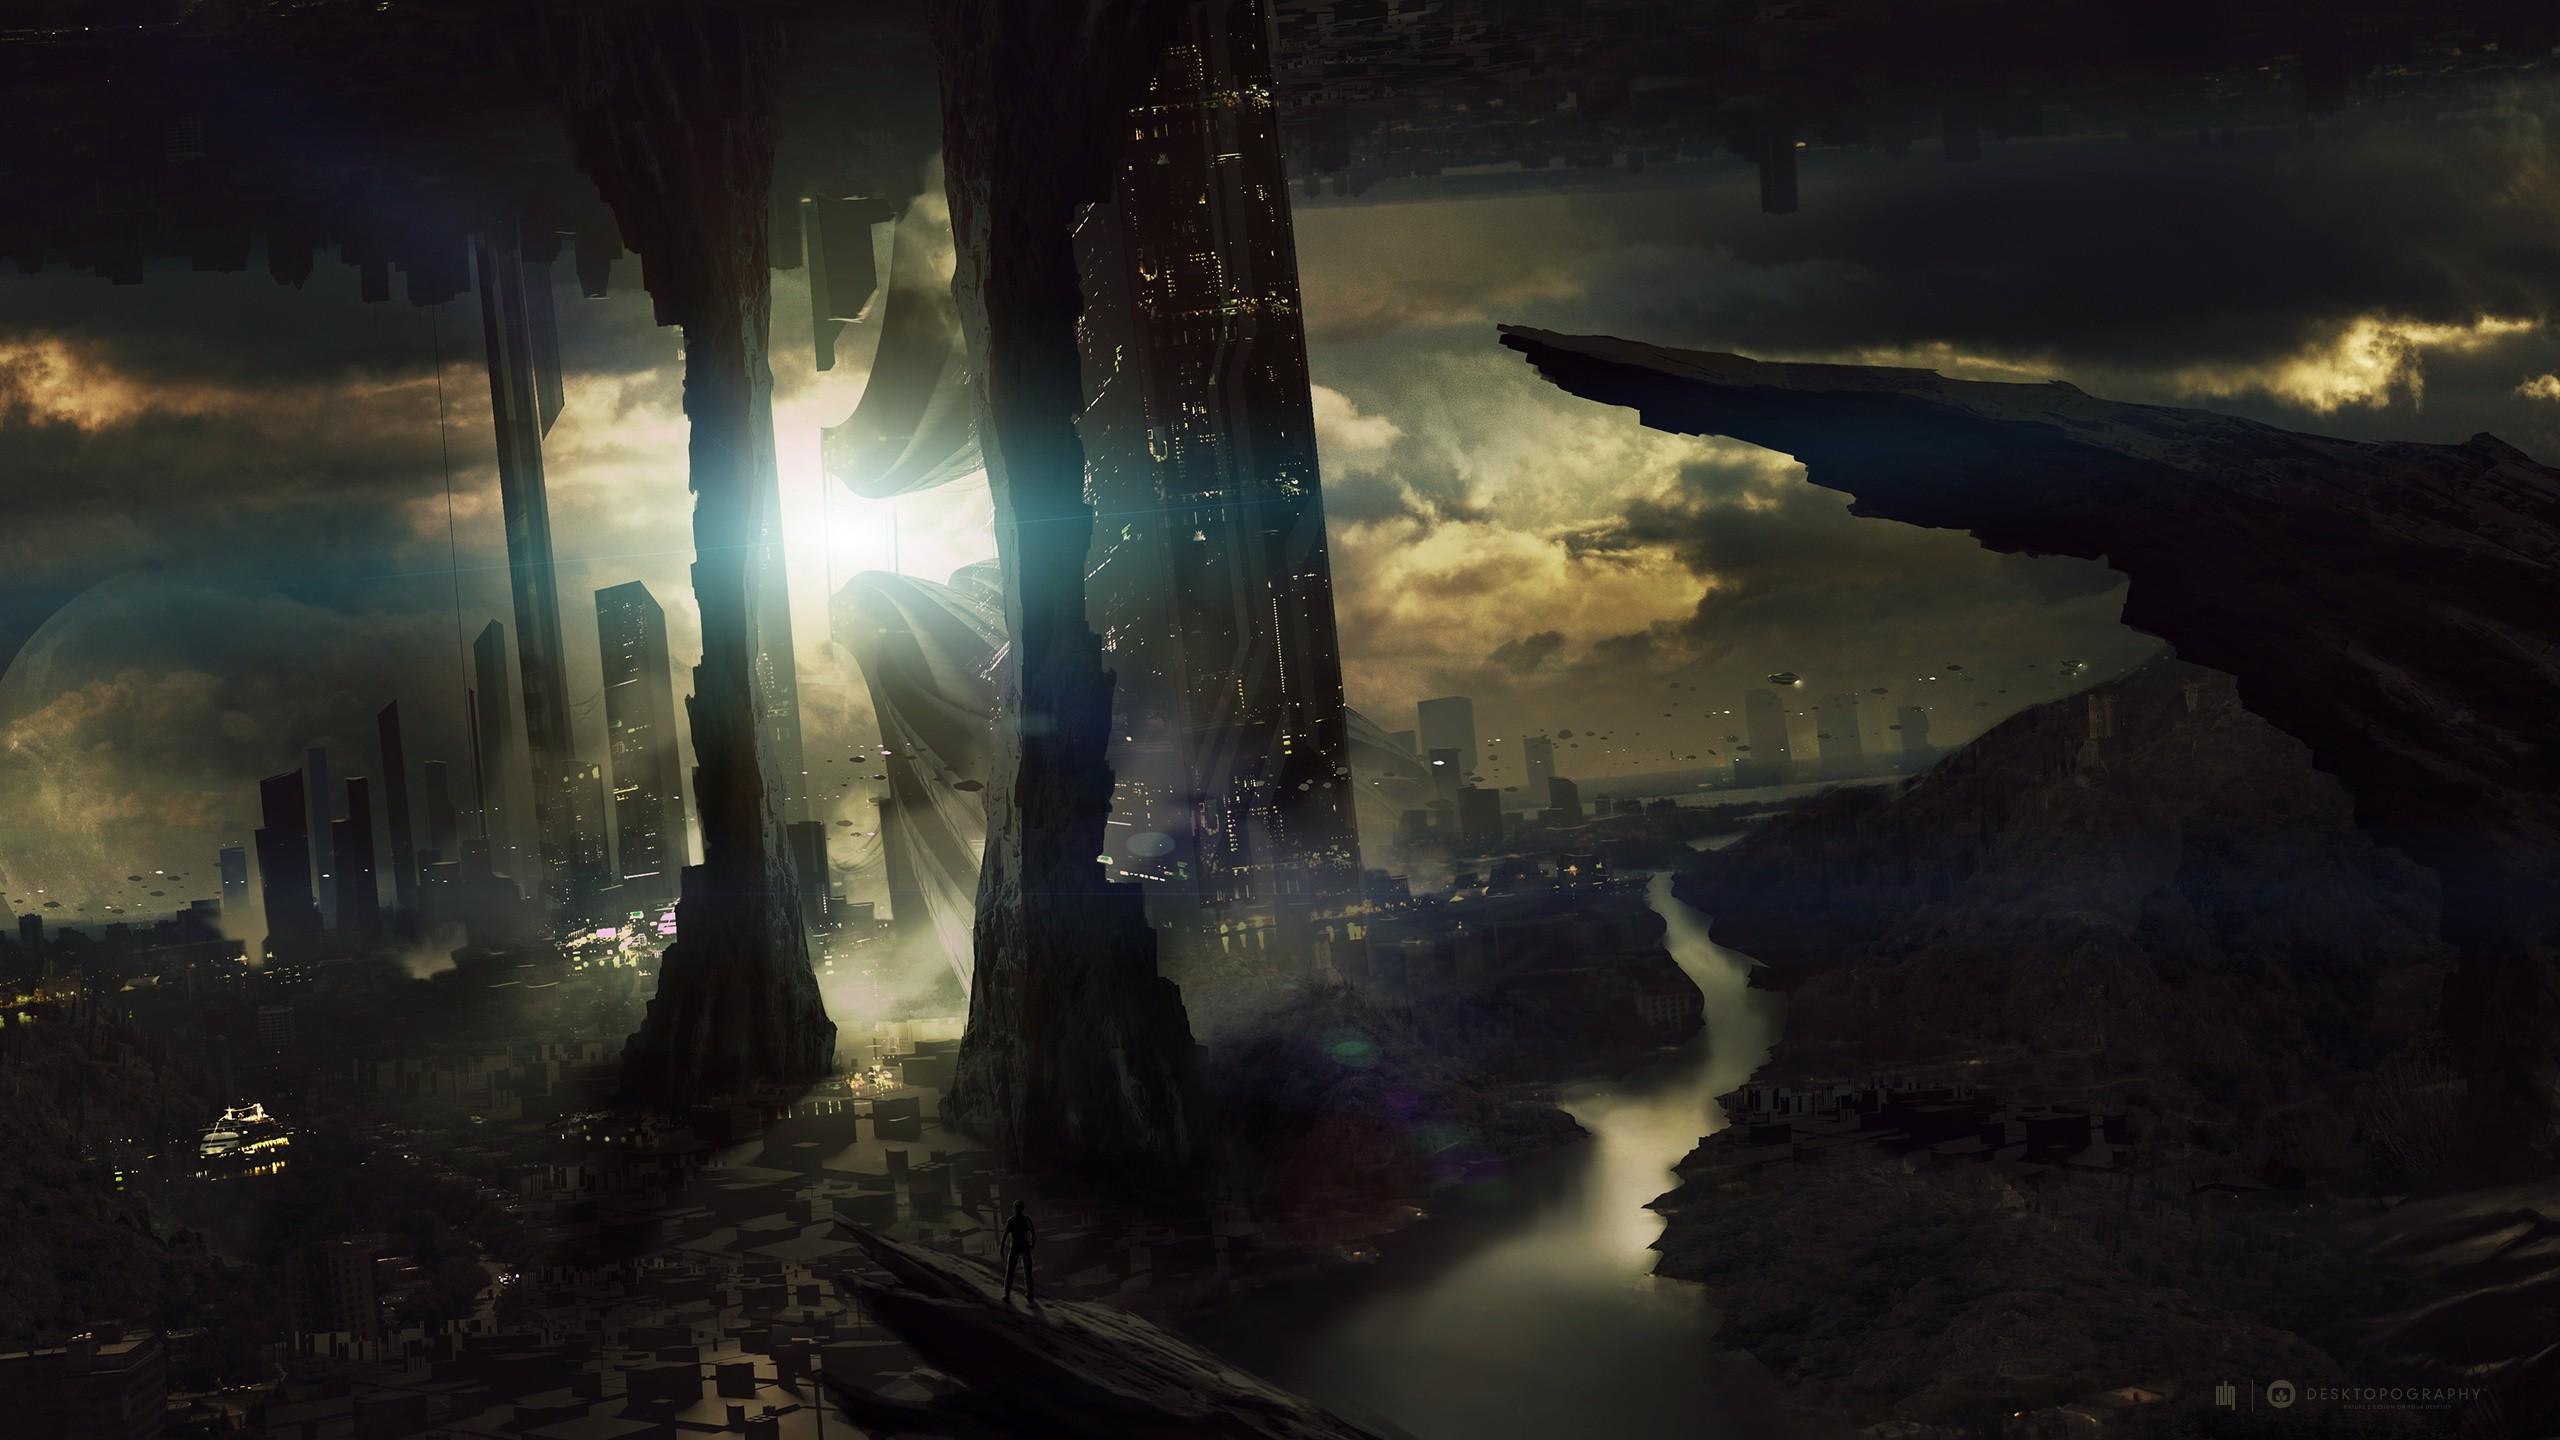 Sci Fi Landscape Wallpaper/Background 2560 x 1440 – Id: 334805 – Wallpaper  Abyss